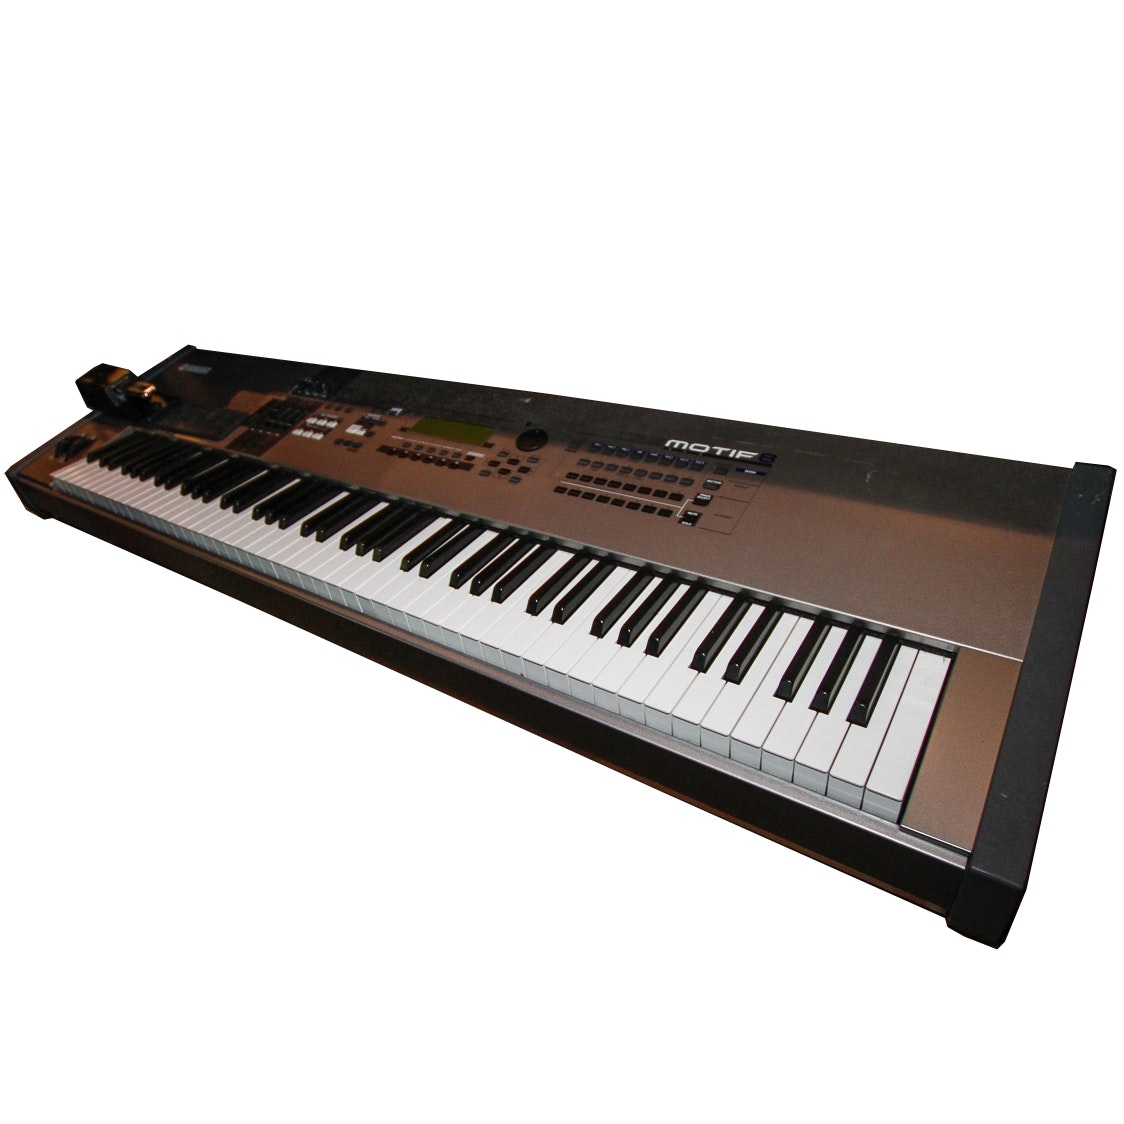 Yamaha Motif 8 Keyboard